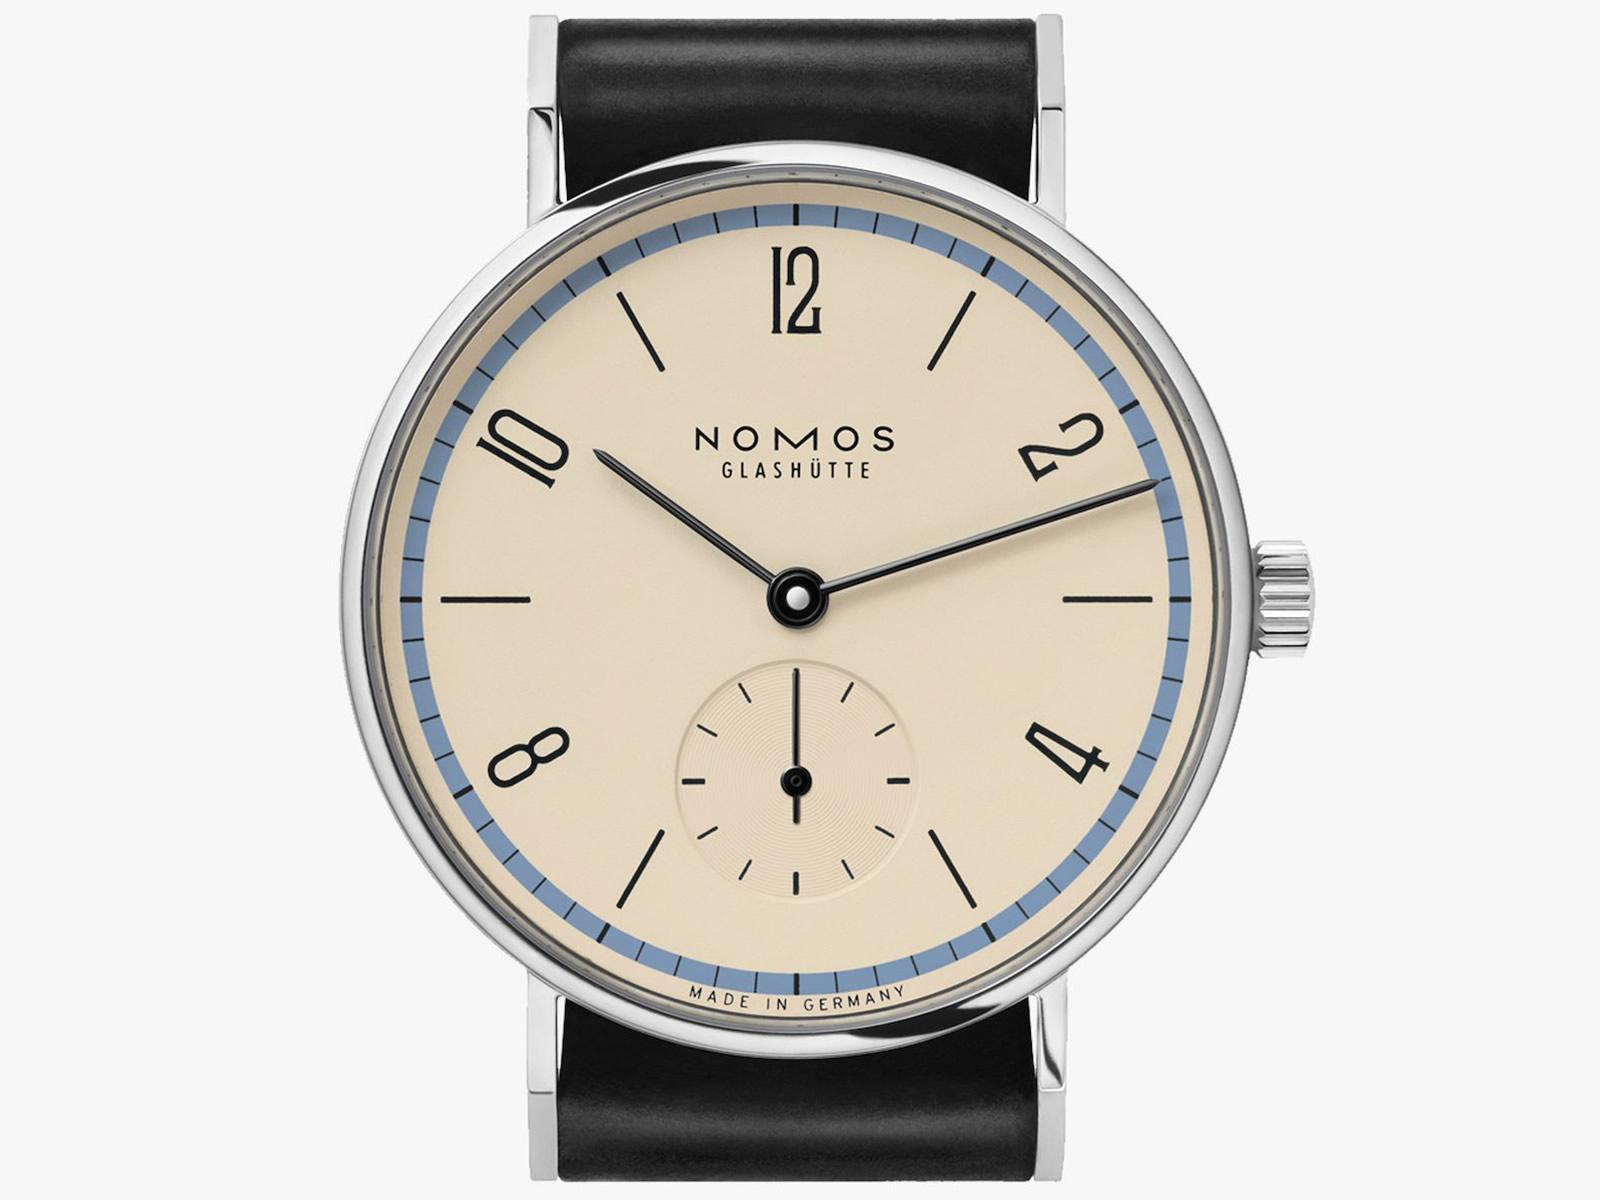 122-s1-nomos-glashutte-tangente-bauhaus-3-.jpg